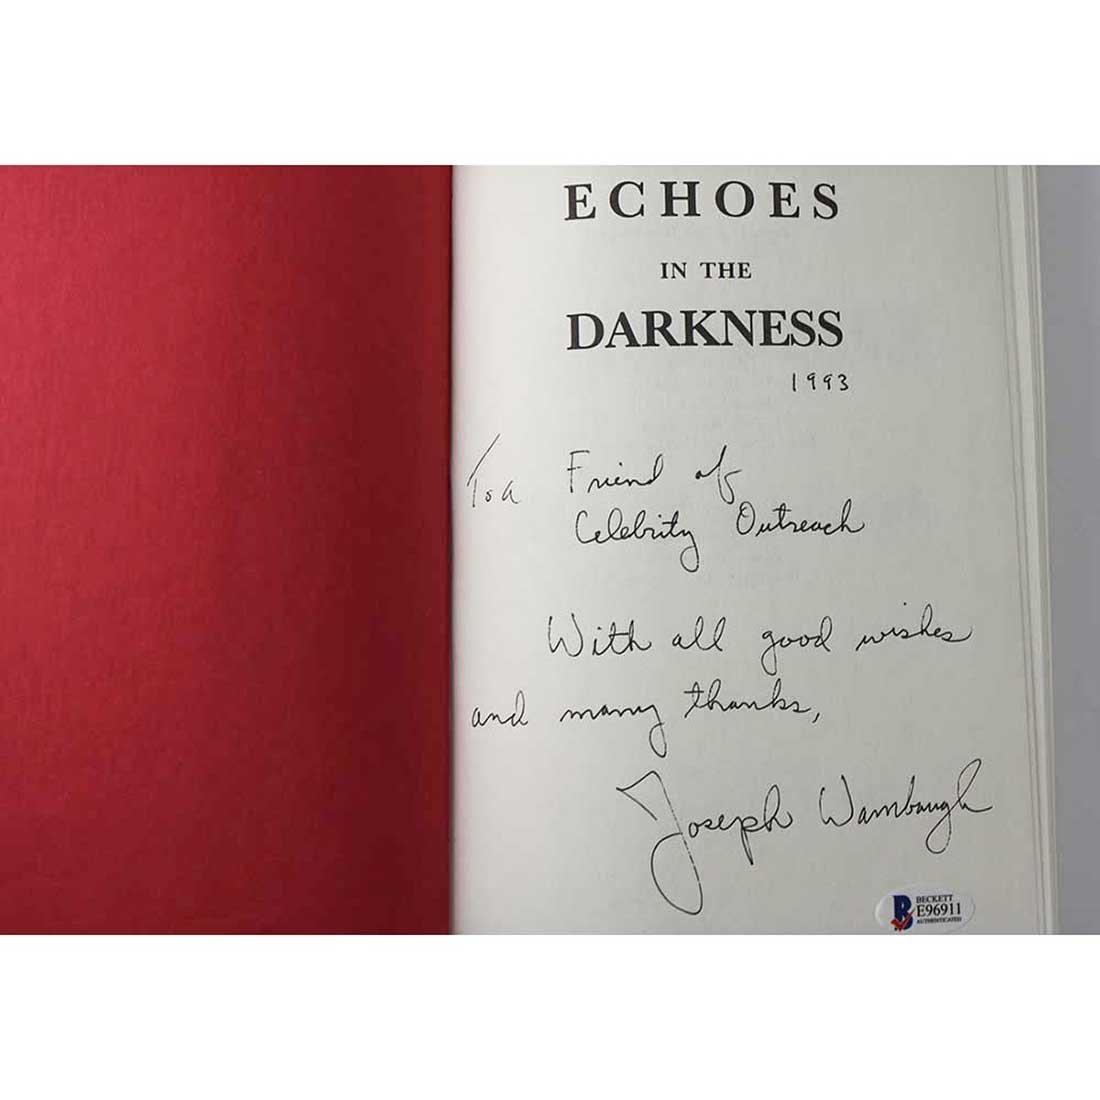 Joseph Wambaugh Autographed Book - 2